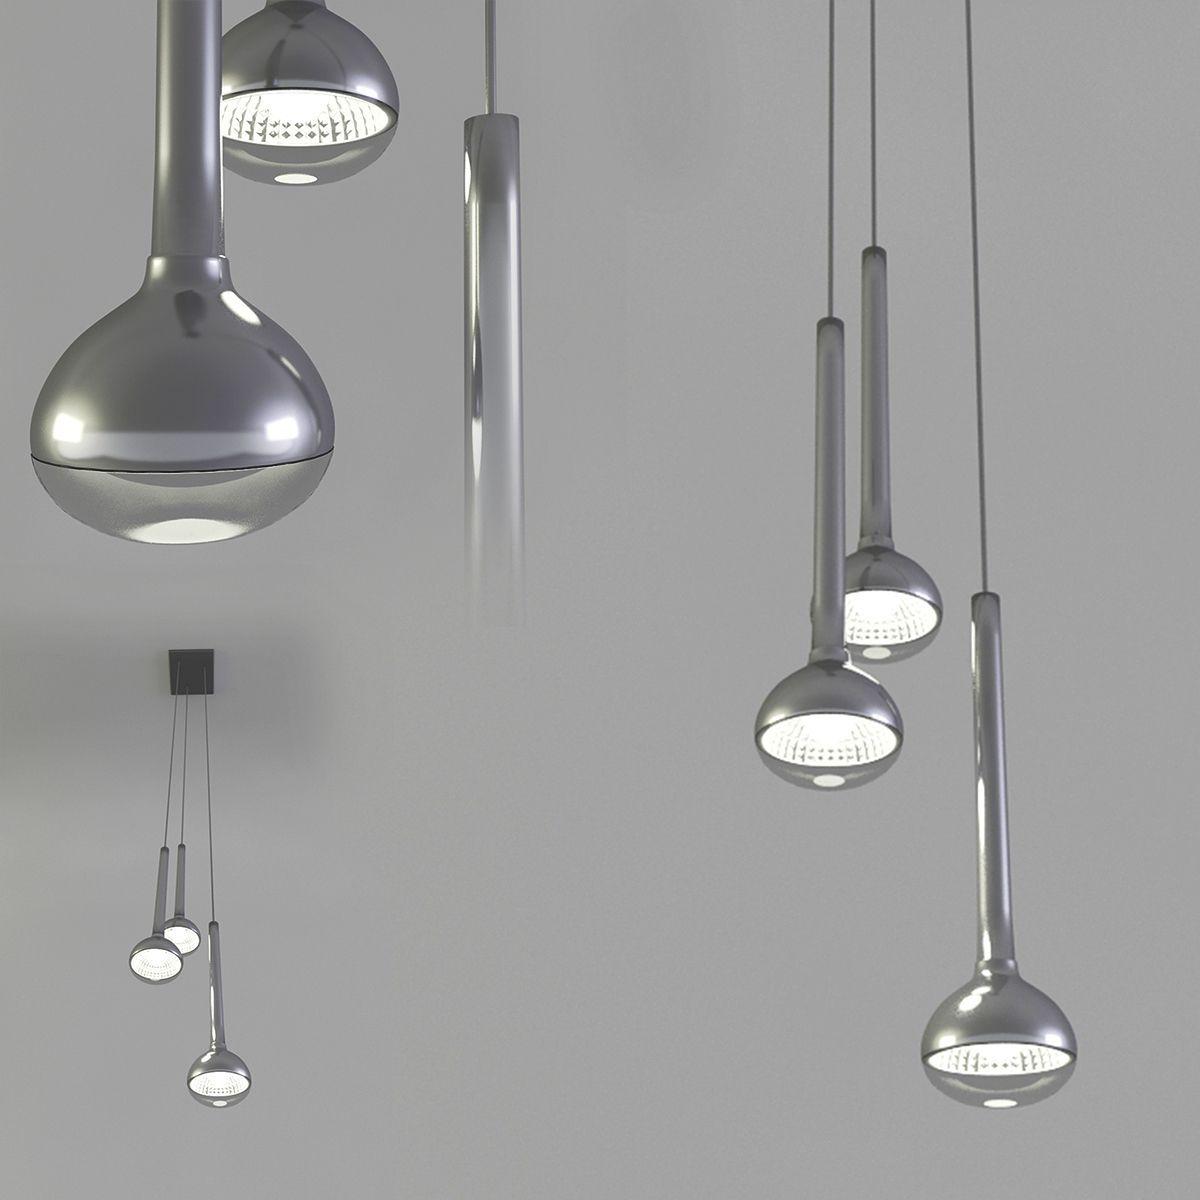 دانلود رایگان مدل سه بعدی لوستر تری دی مکس 3DDD - Ceiling Lamp